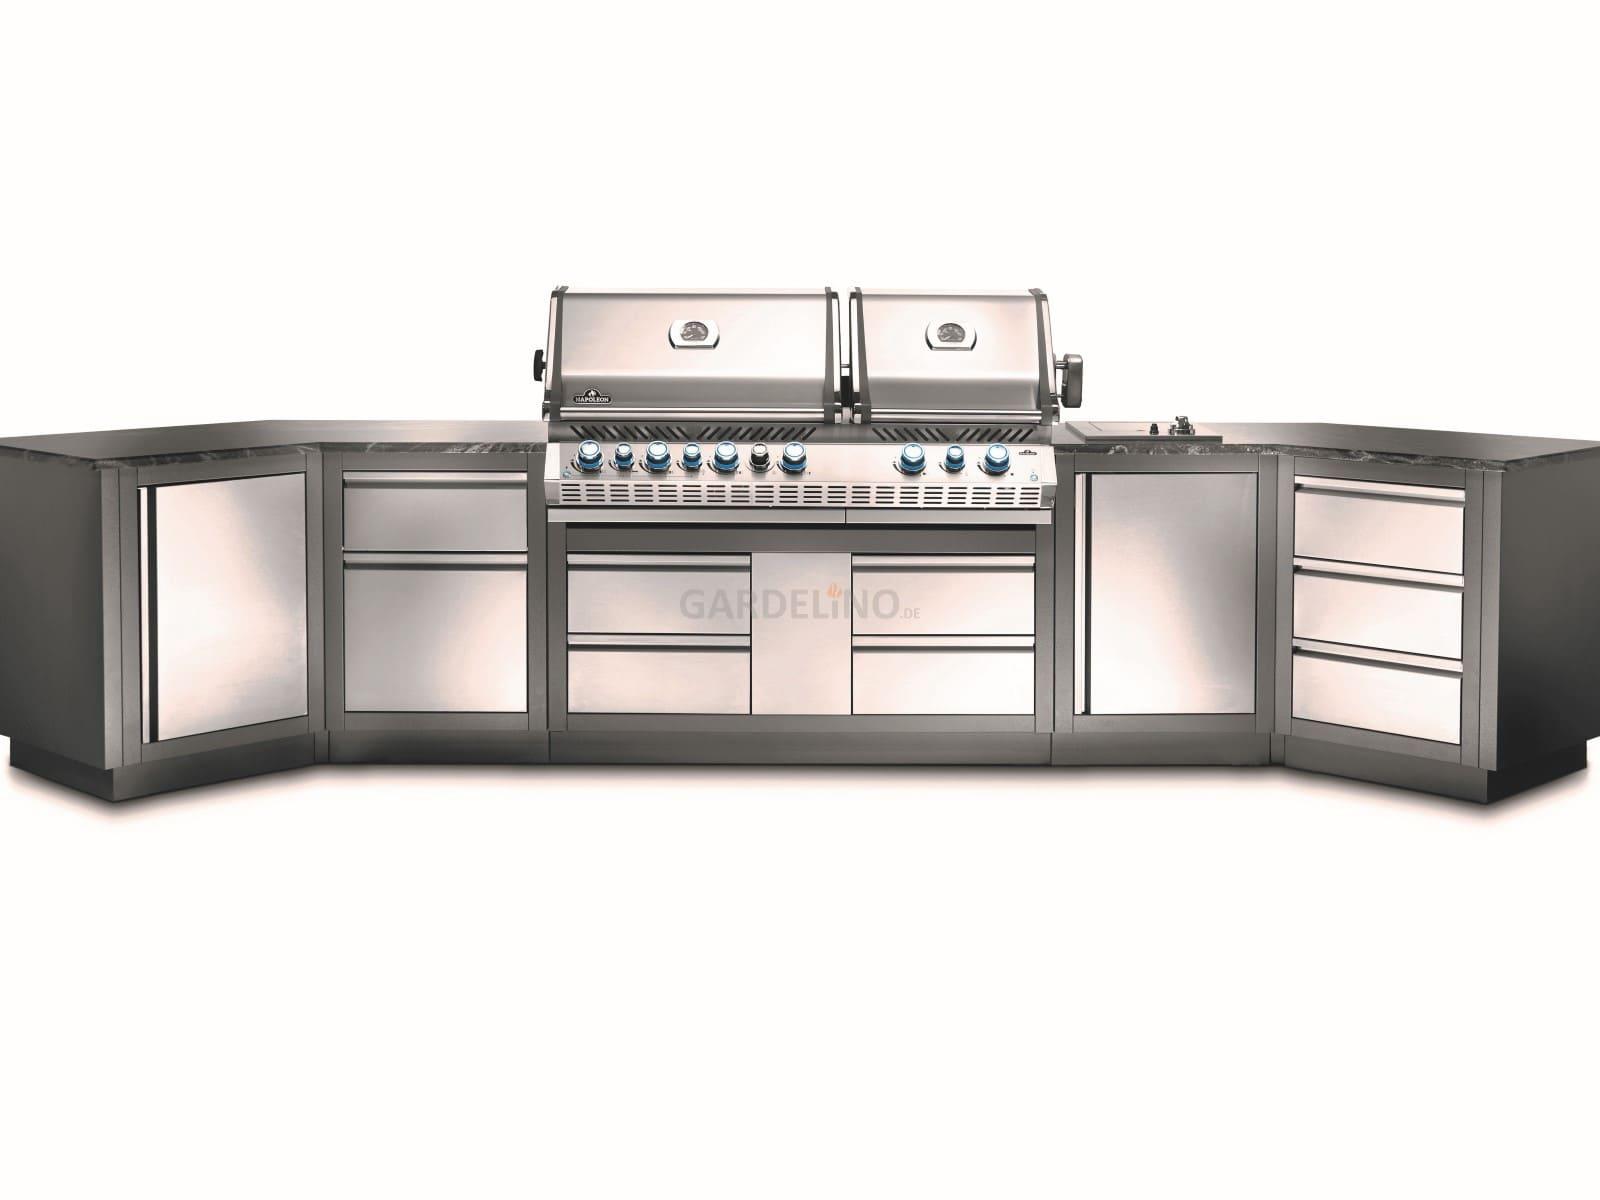 Napoleon Gasgrill Outdoorküche : Napoleon grill shop bei gardelino